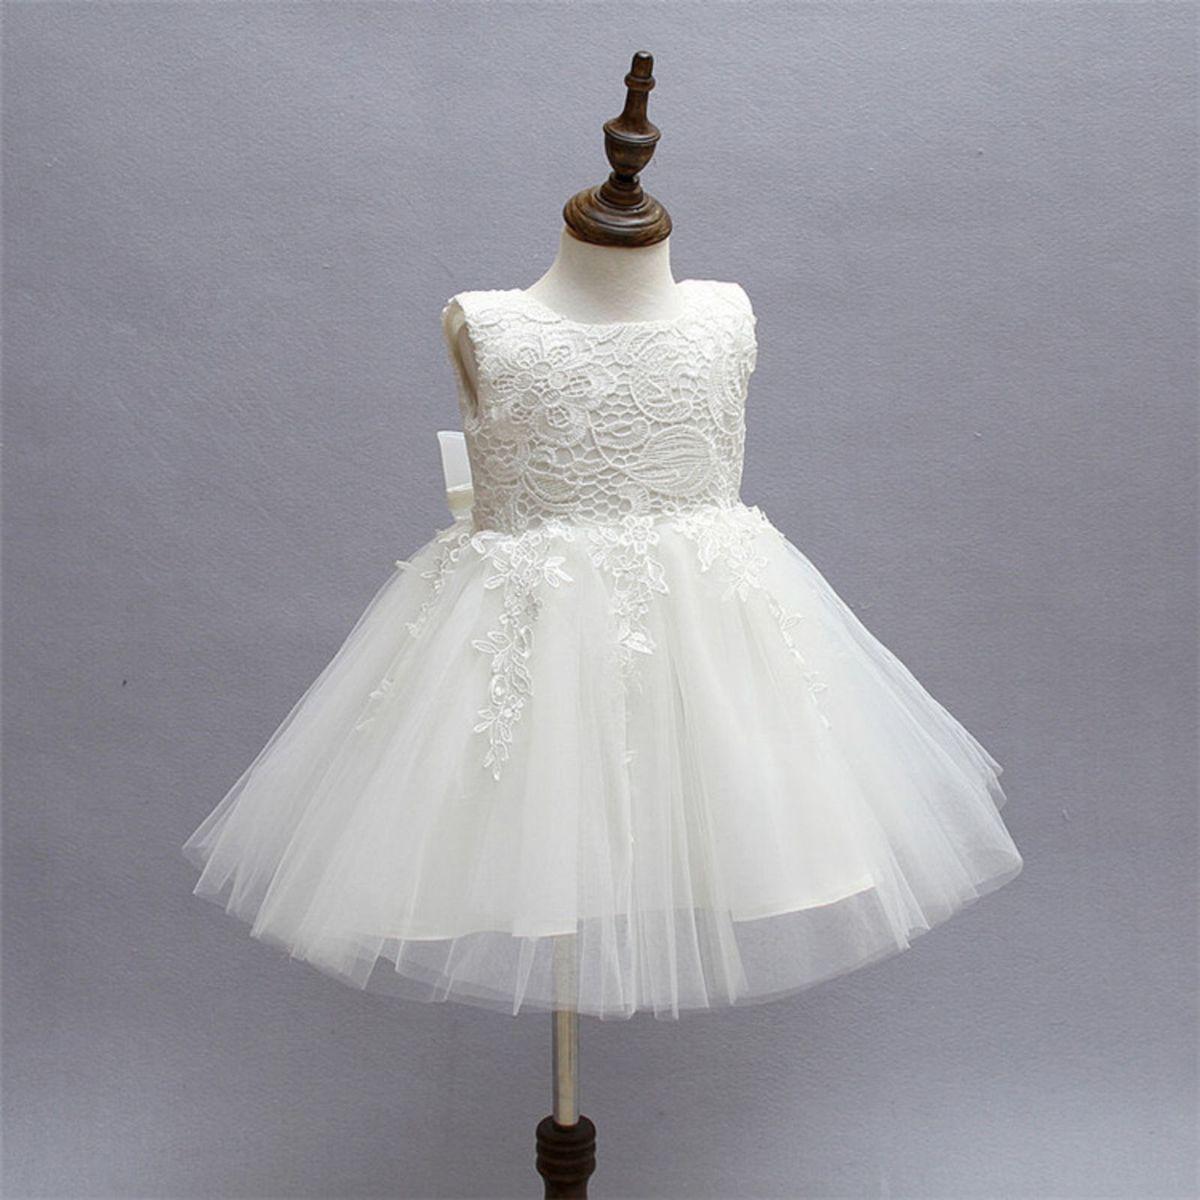 96c6455a78 Vestido Bebês - Batizado - Festa - Branco